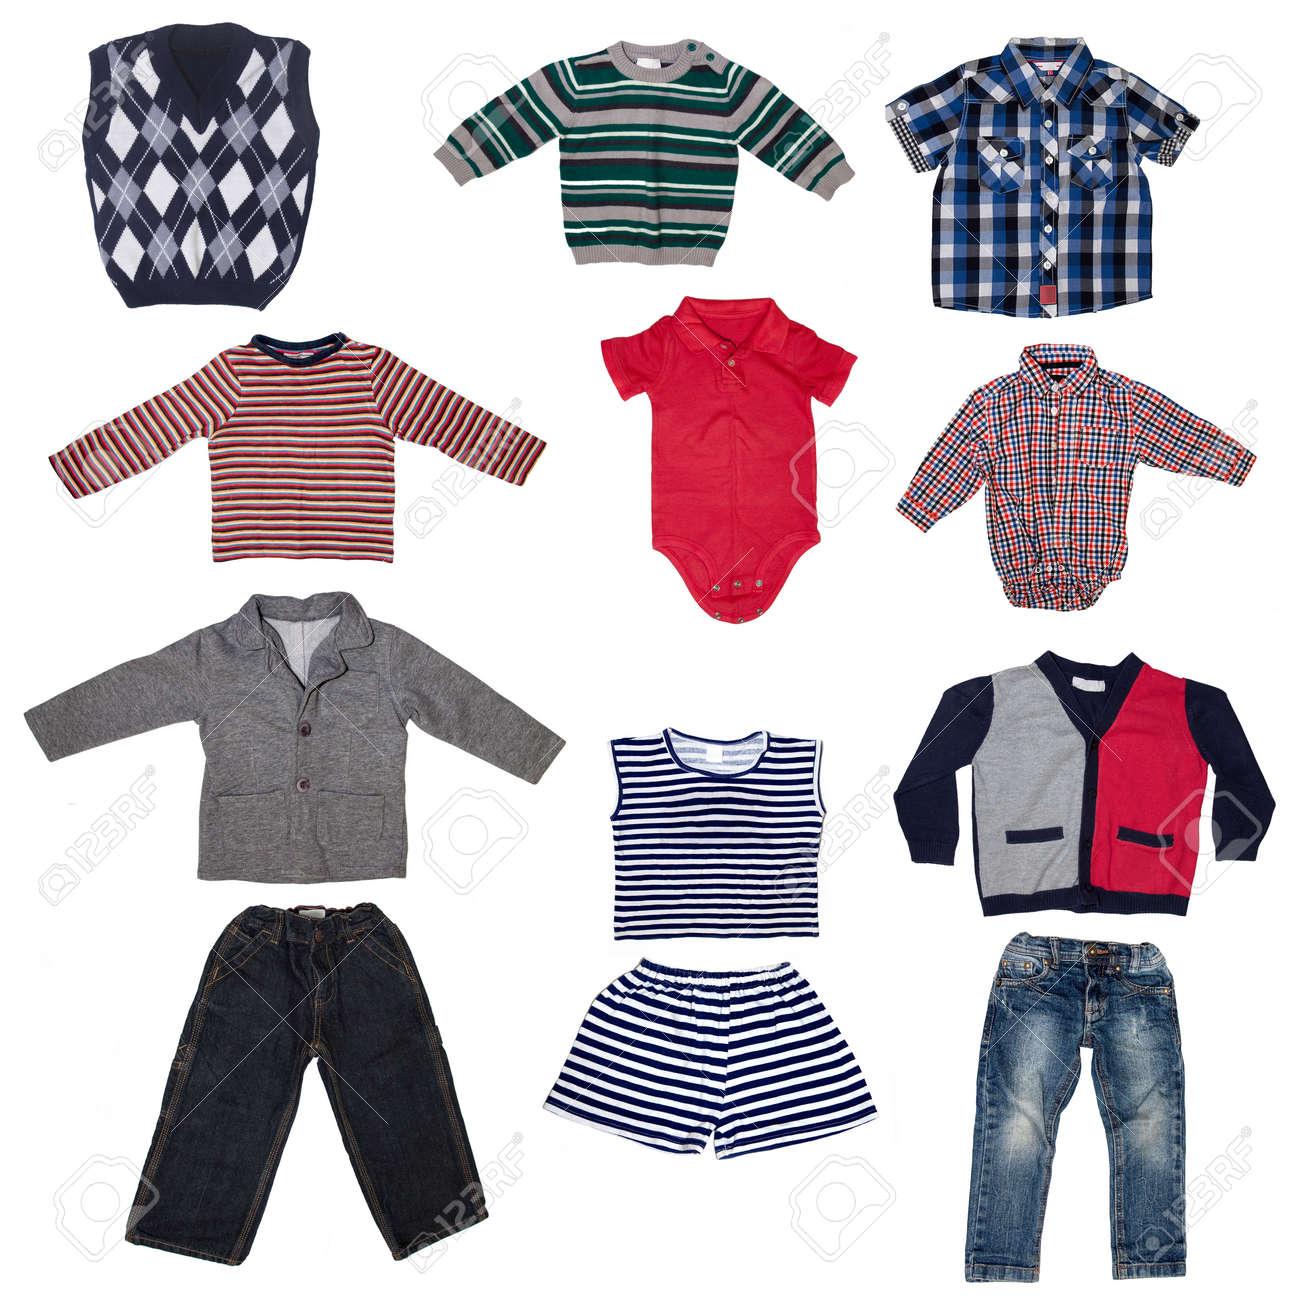 cc09b0342d0c Fashion Modern Male Baby Clothes.Collage Set Of Boy Kid Wear Stock ...